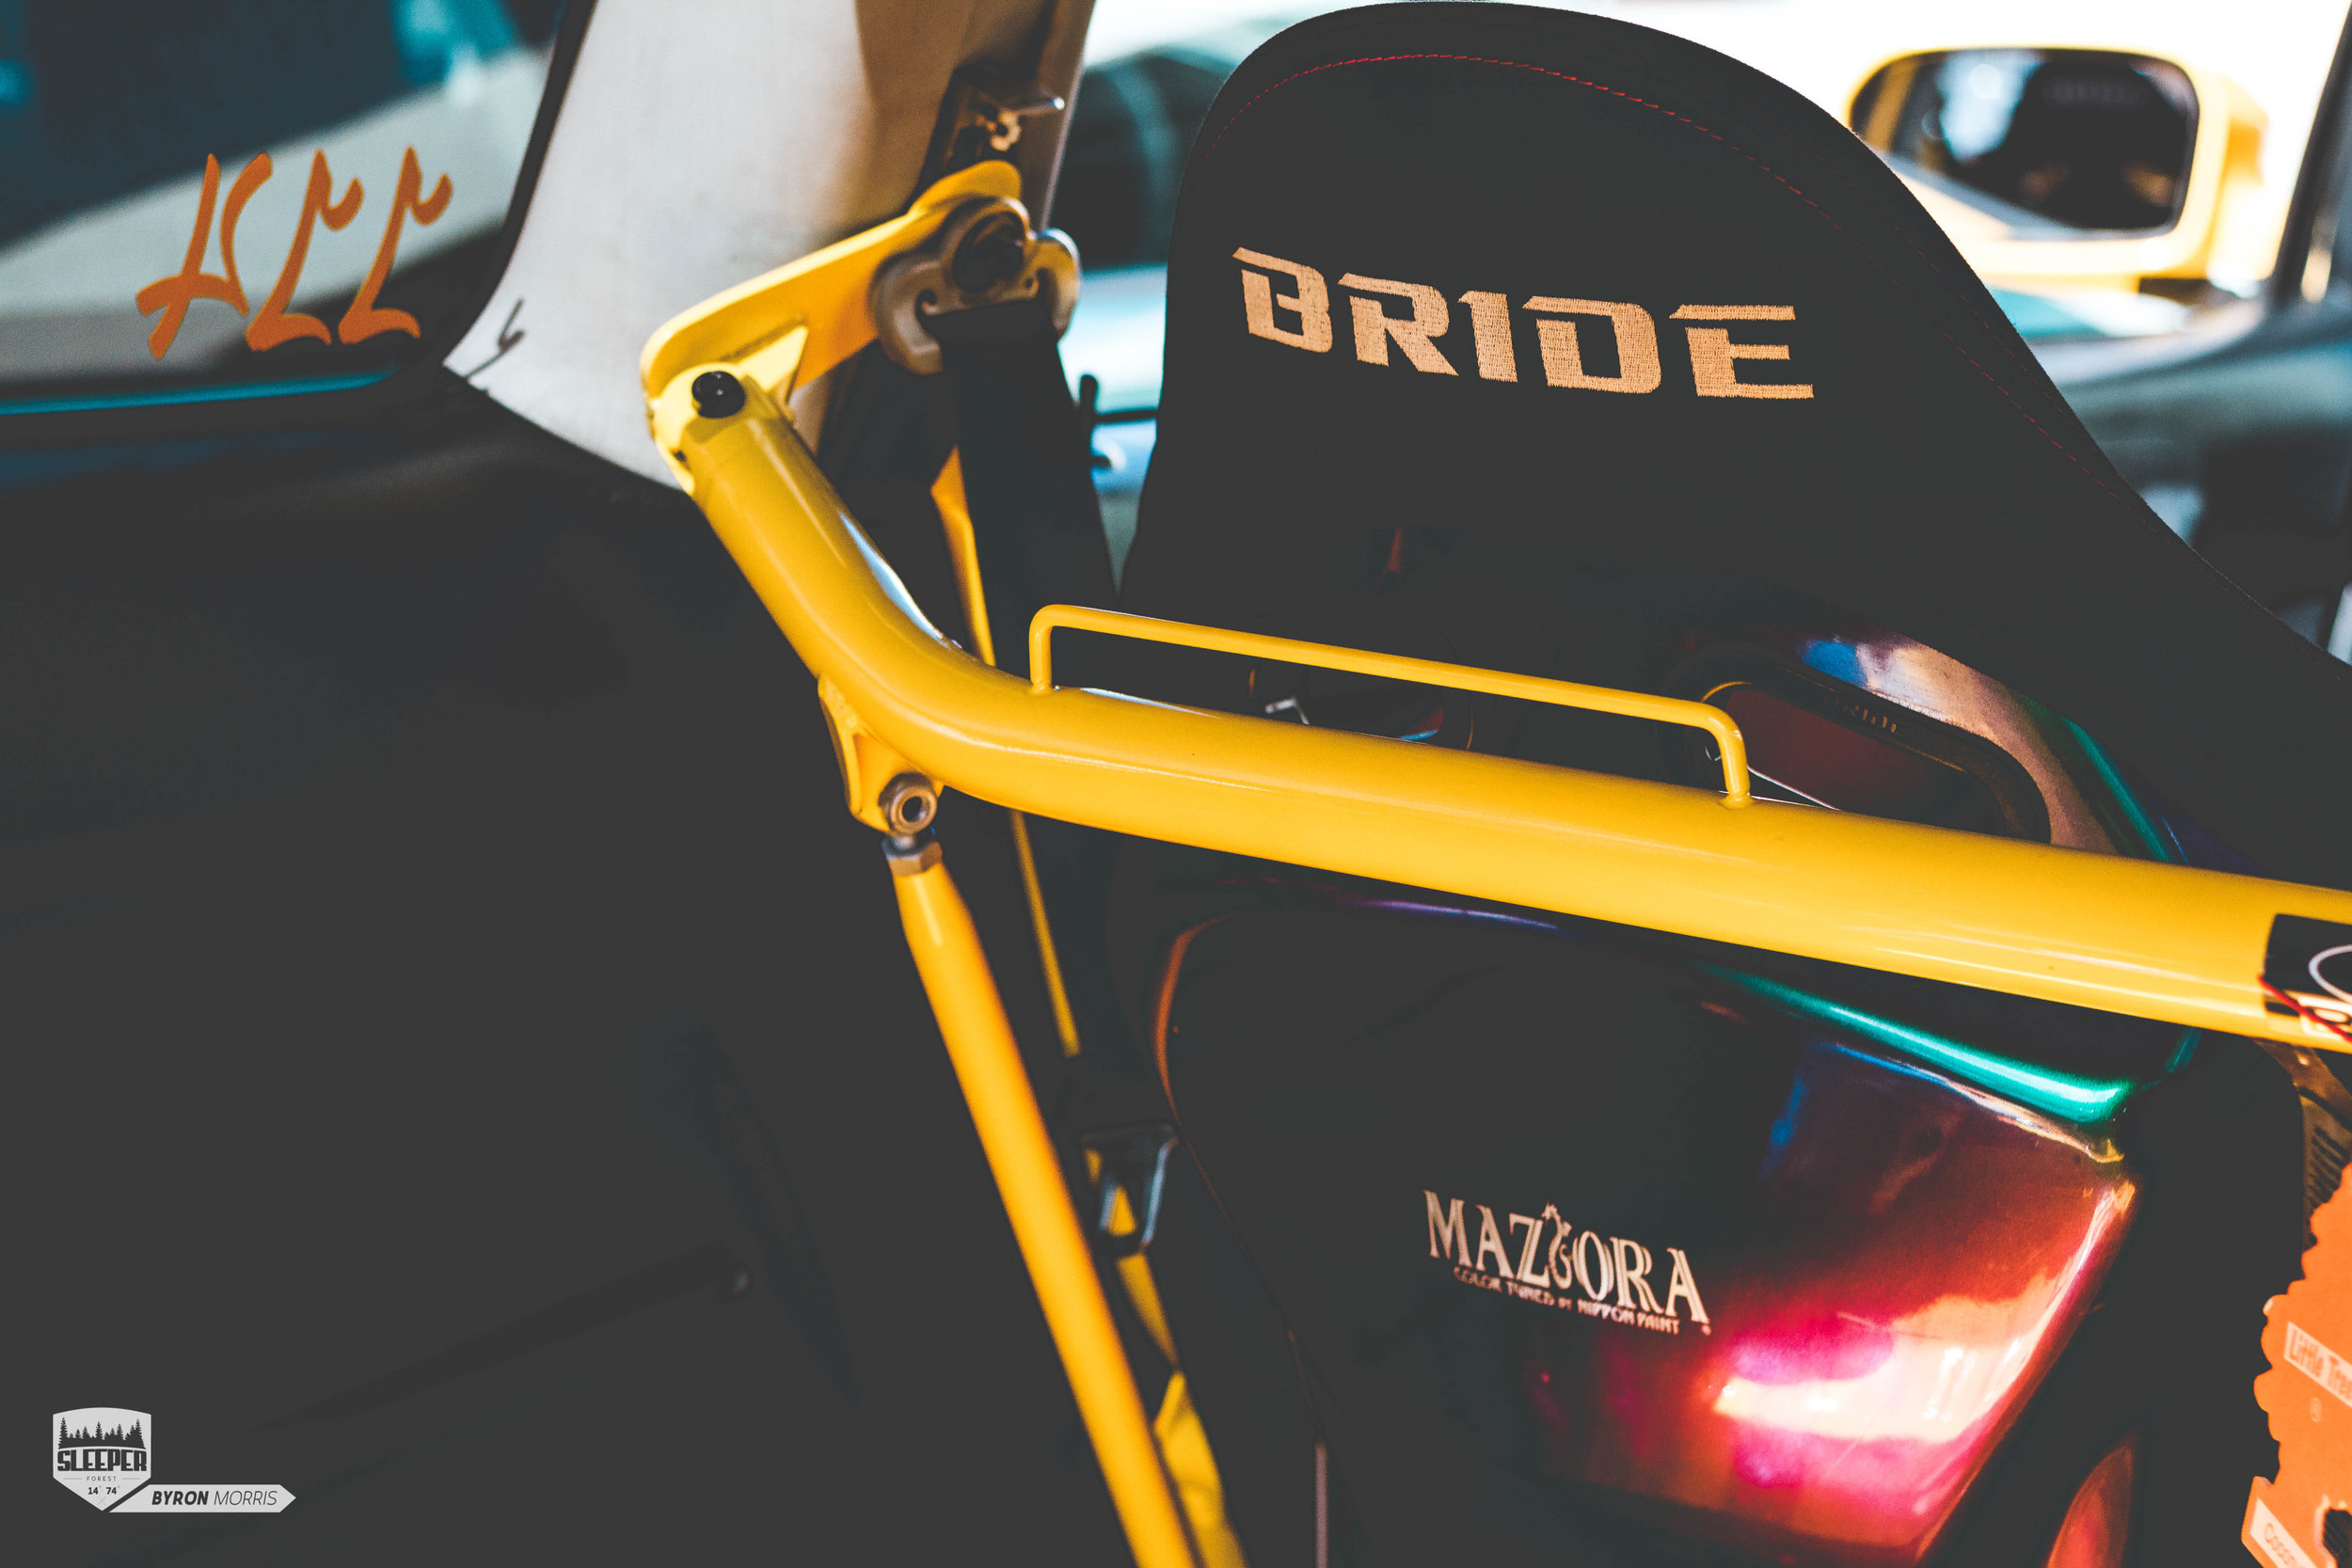 Rep_ya_ride_2019_barbados_car_culture-10.jpg